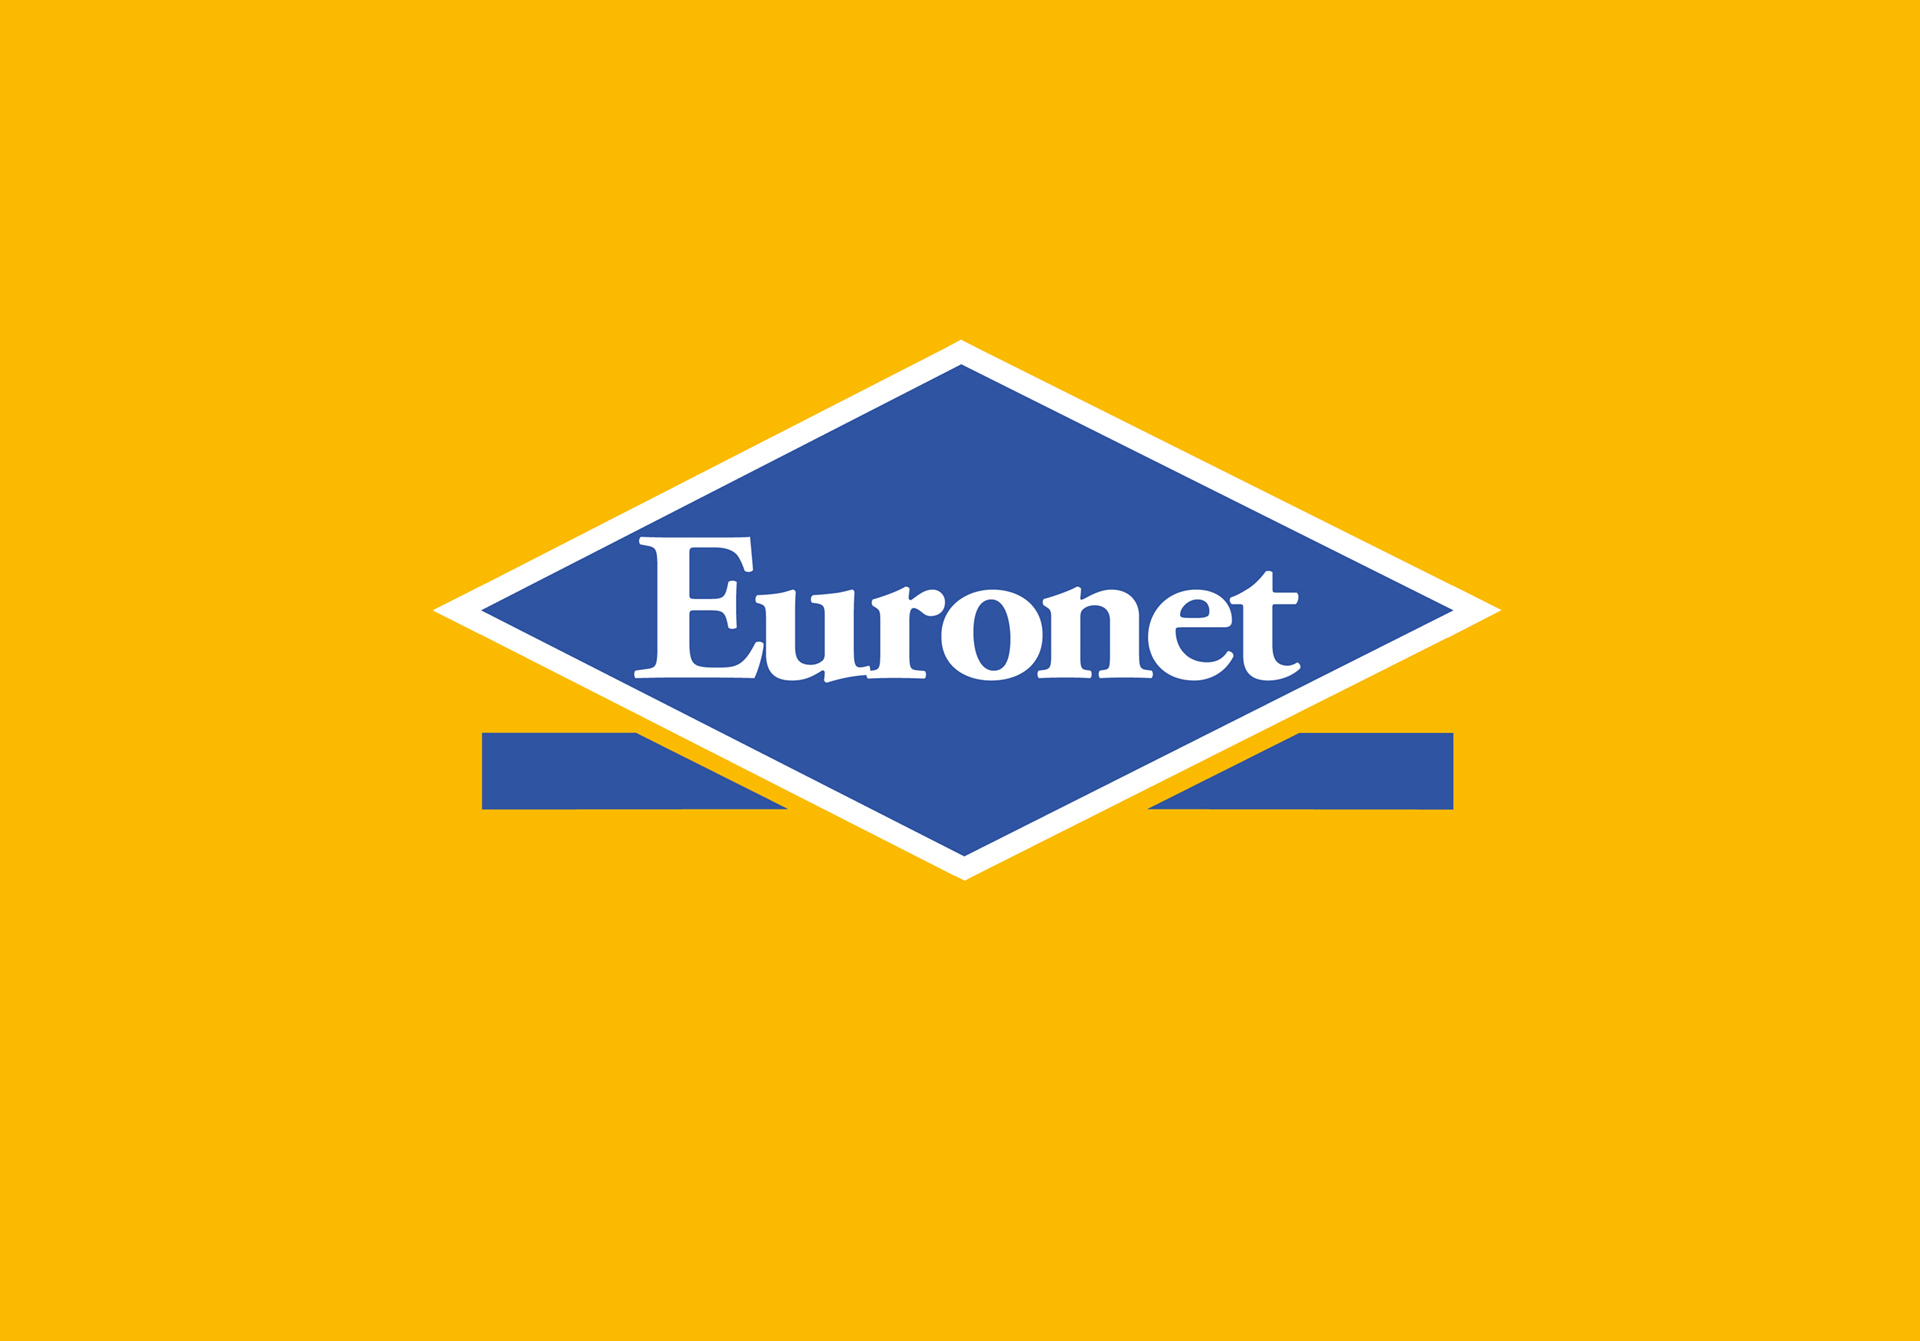 Euronet - Geldautomat - ATM Leipzig